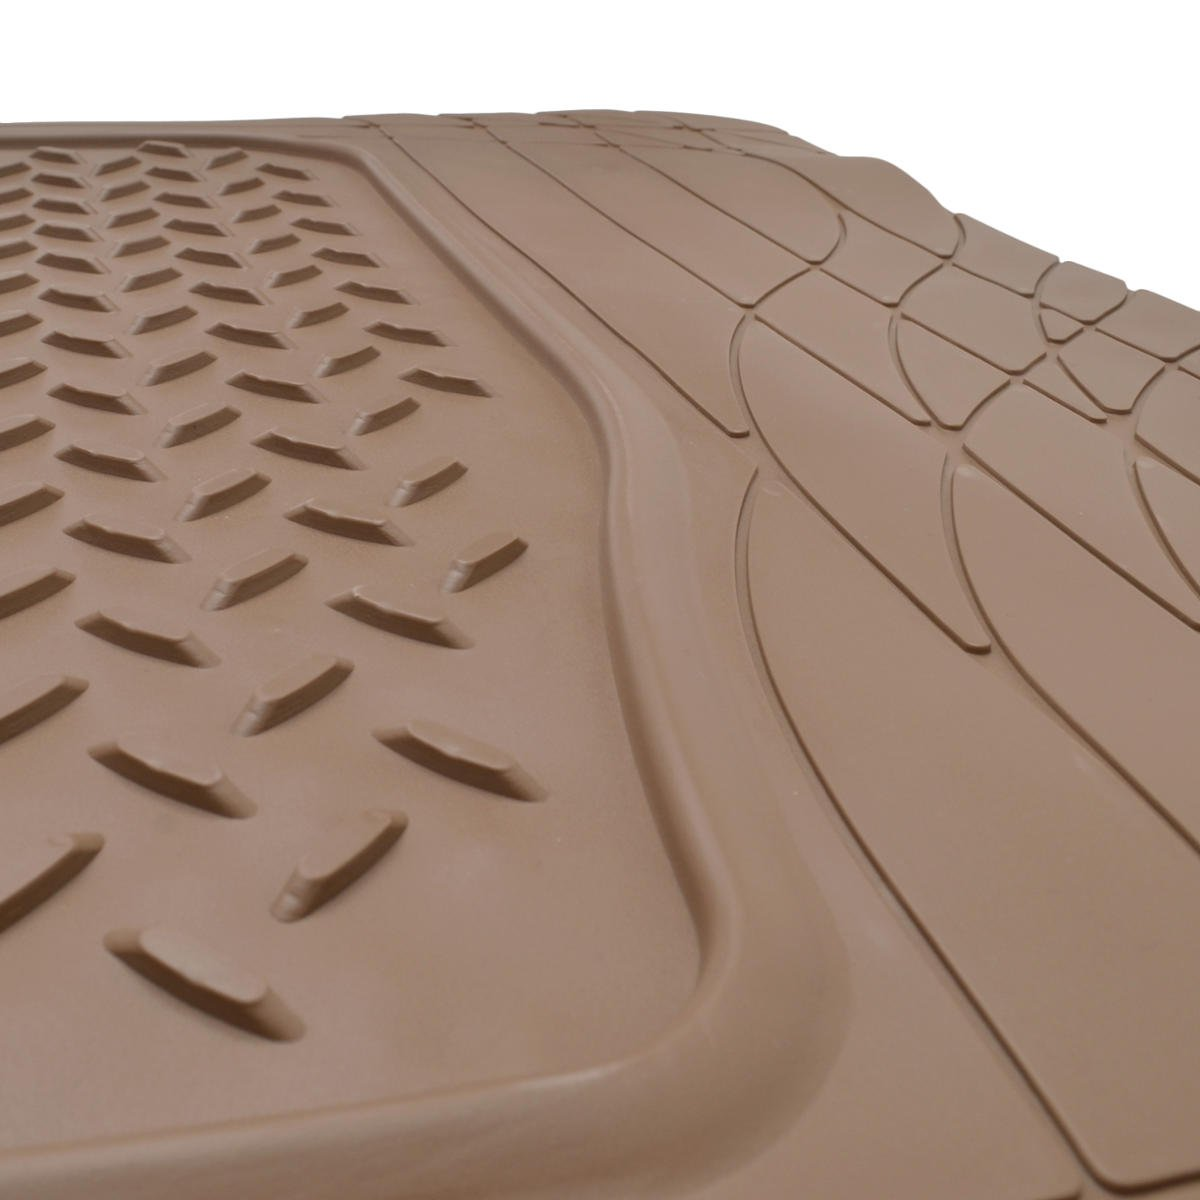 Gray PVC BDK Universal Fit Premium Cargo Car Trunk Mat//Liner 31.5 x 50